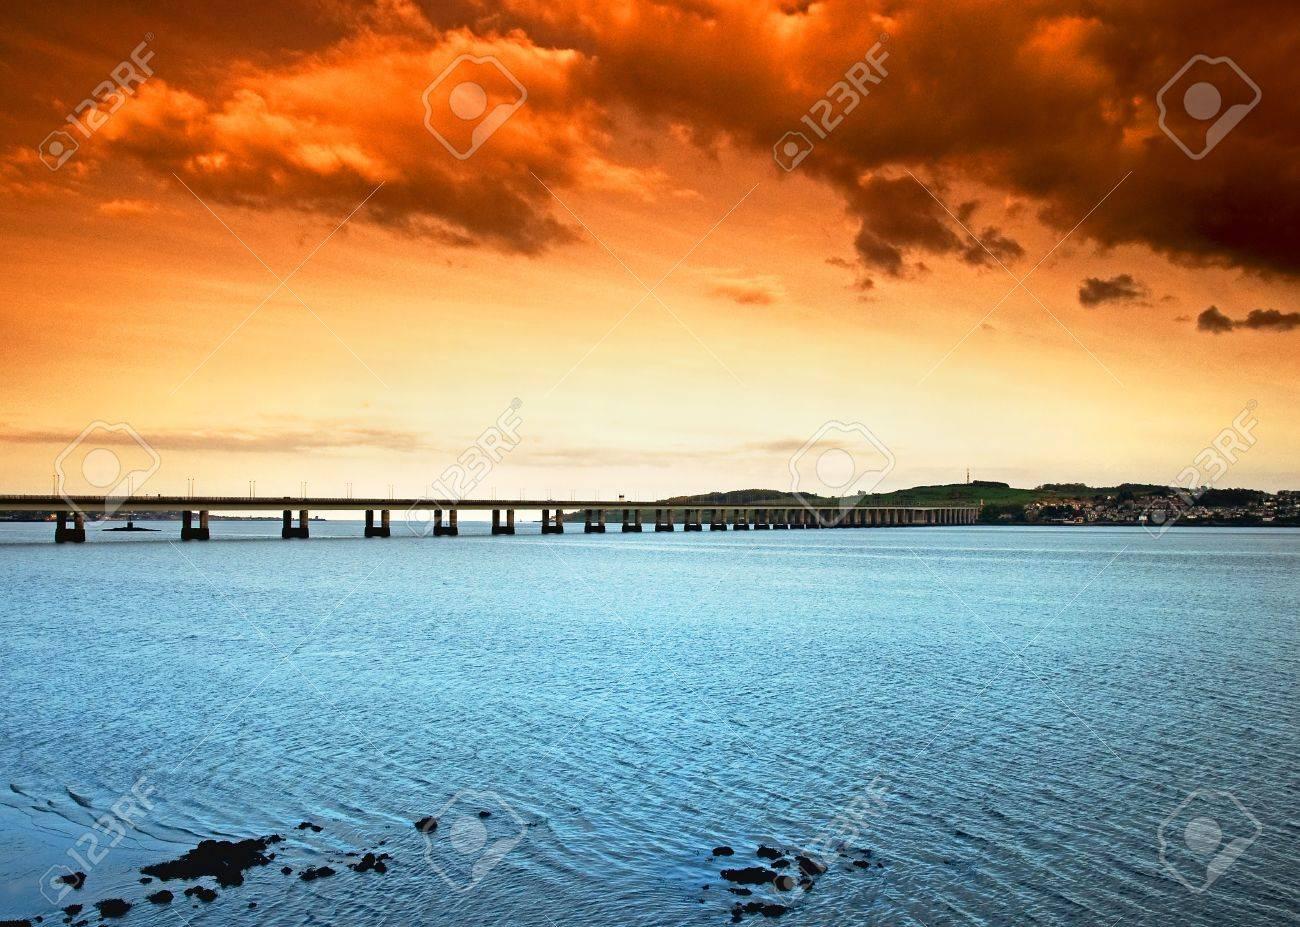 Dundee city Scotland - 16995743